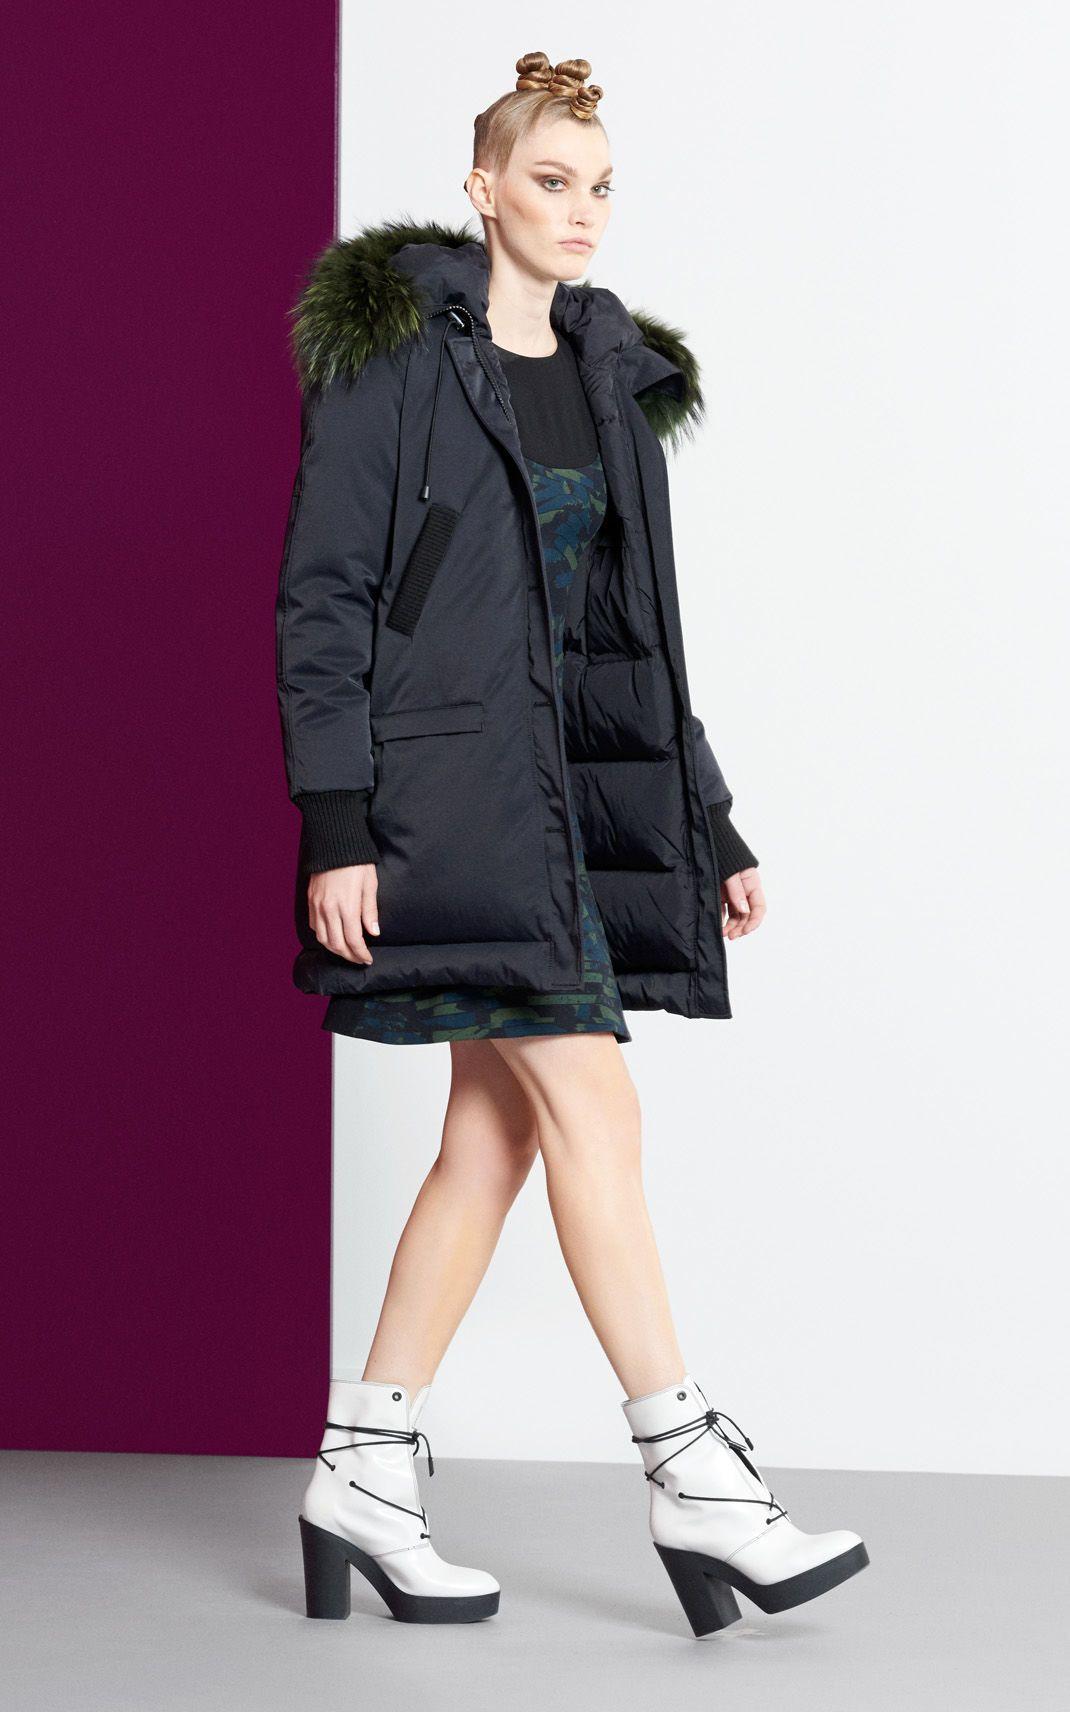 b06ca2b0 Fur Parka for Kenzo | Kenzo.com | Outerwear | Kenzo clothing, Parka ...